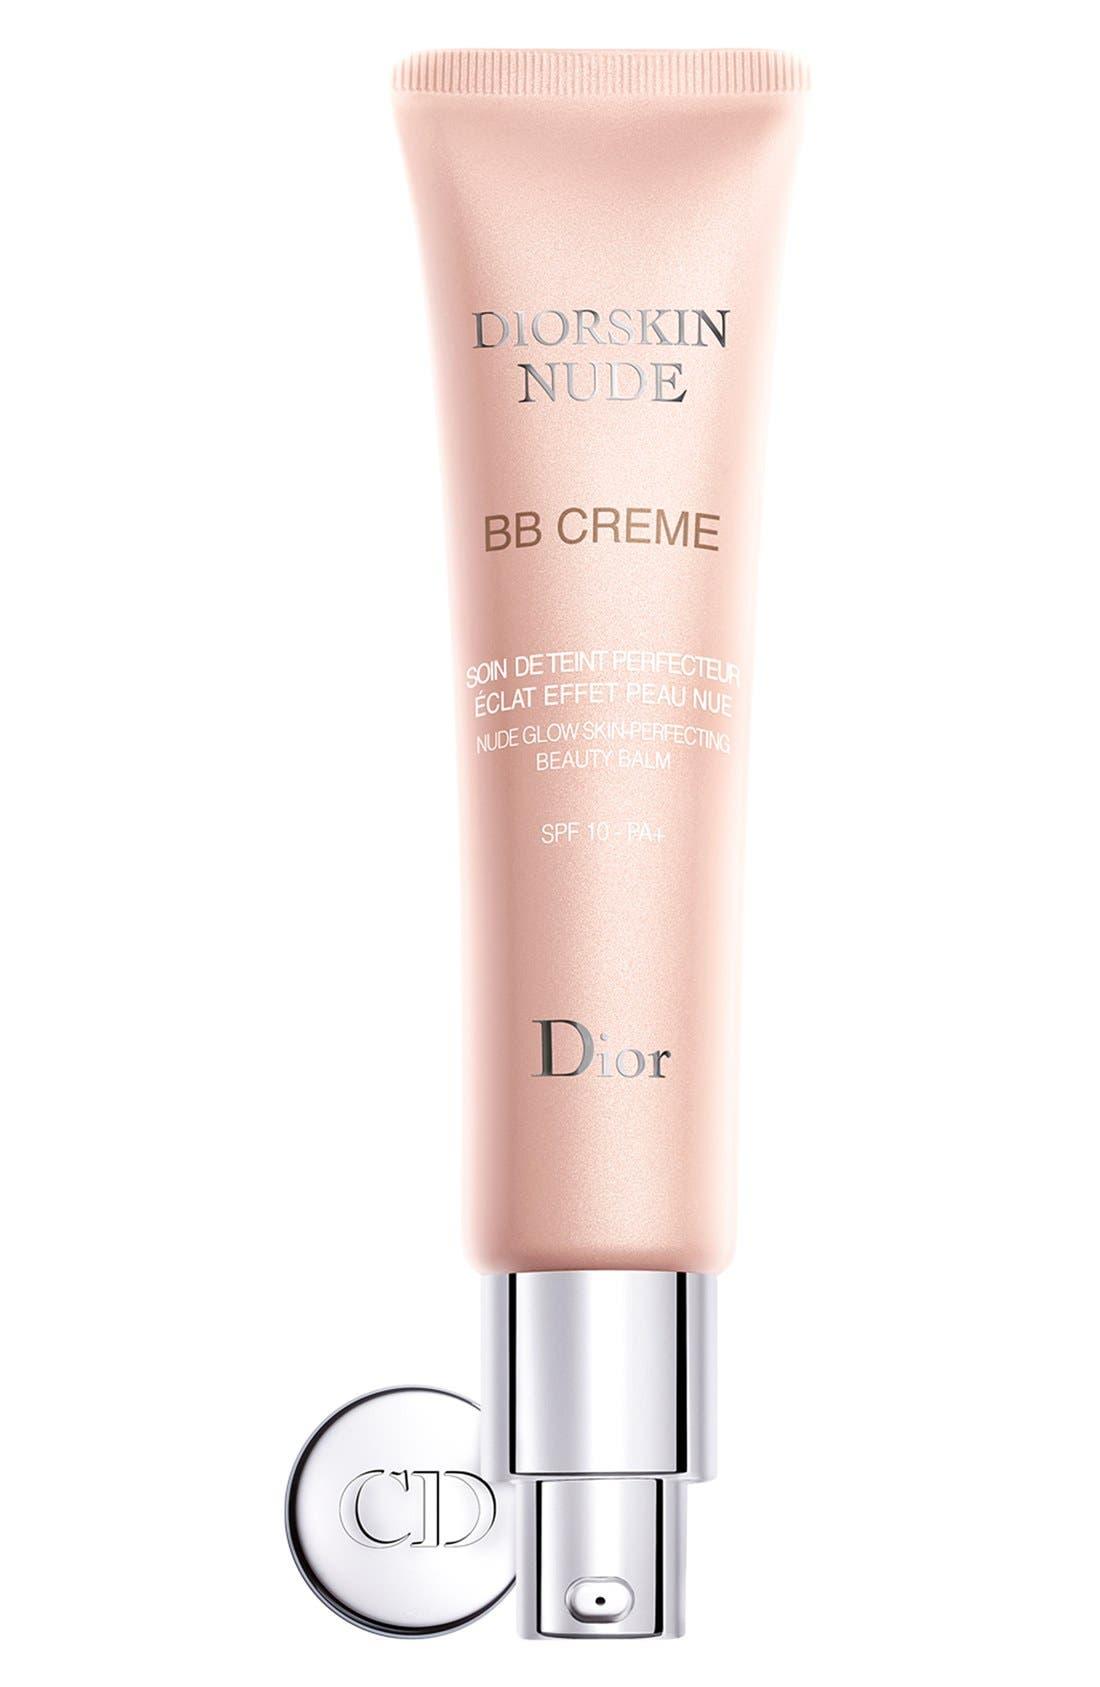 Dior 'Diorskin Nude' BB Creme Broad Spectrum SPF 10